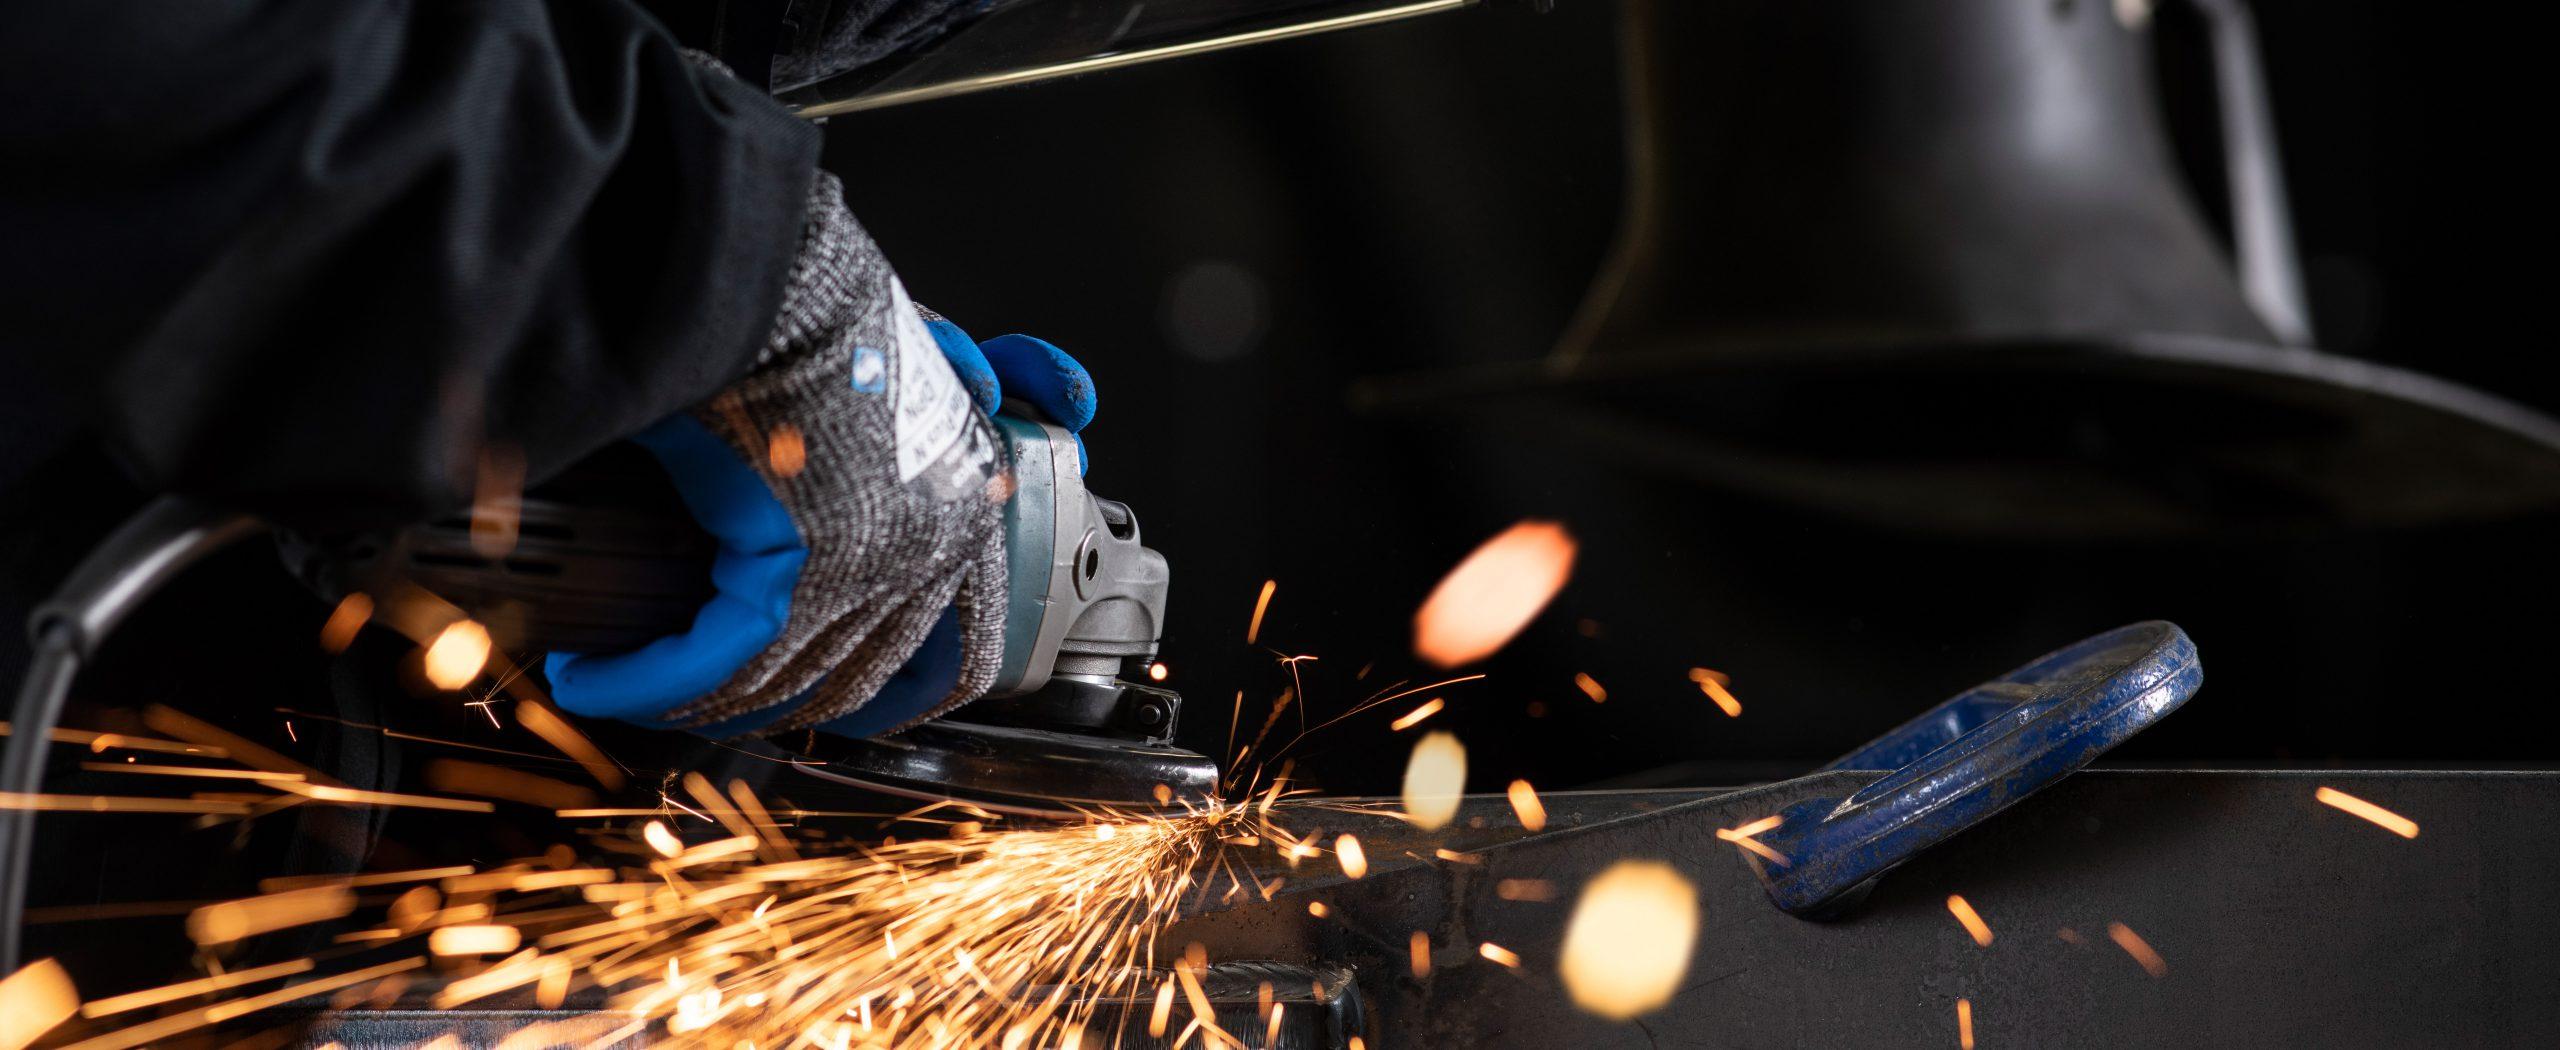 Our work - sheet metal fabrication case studies